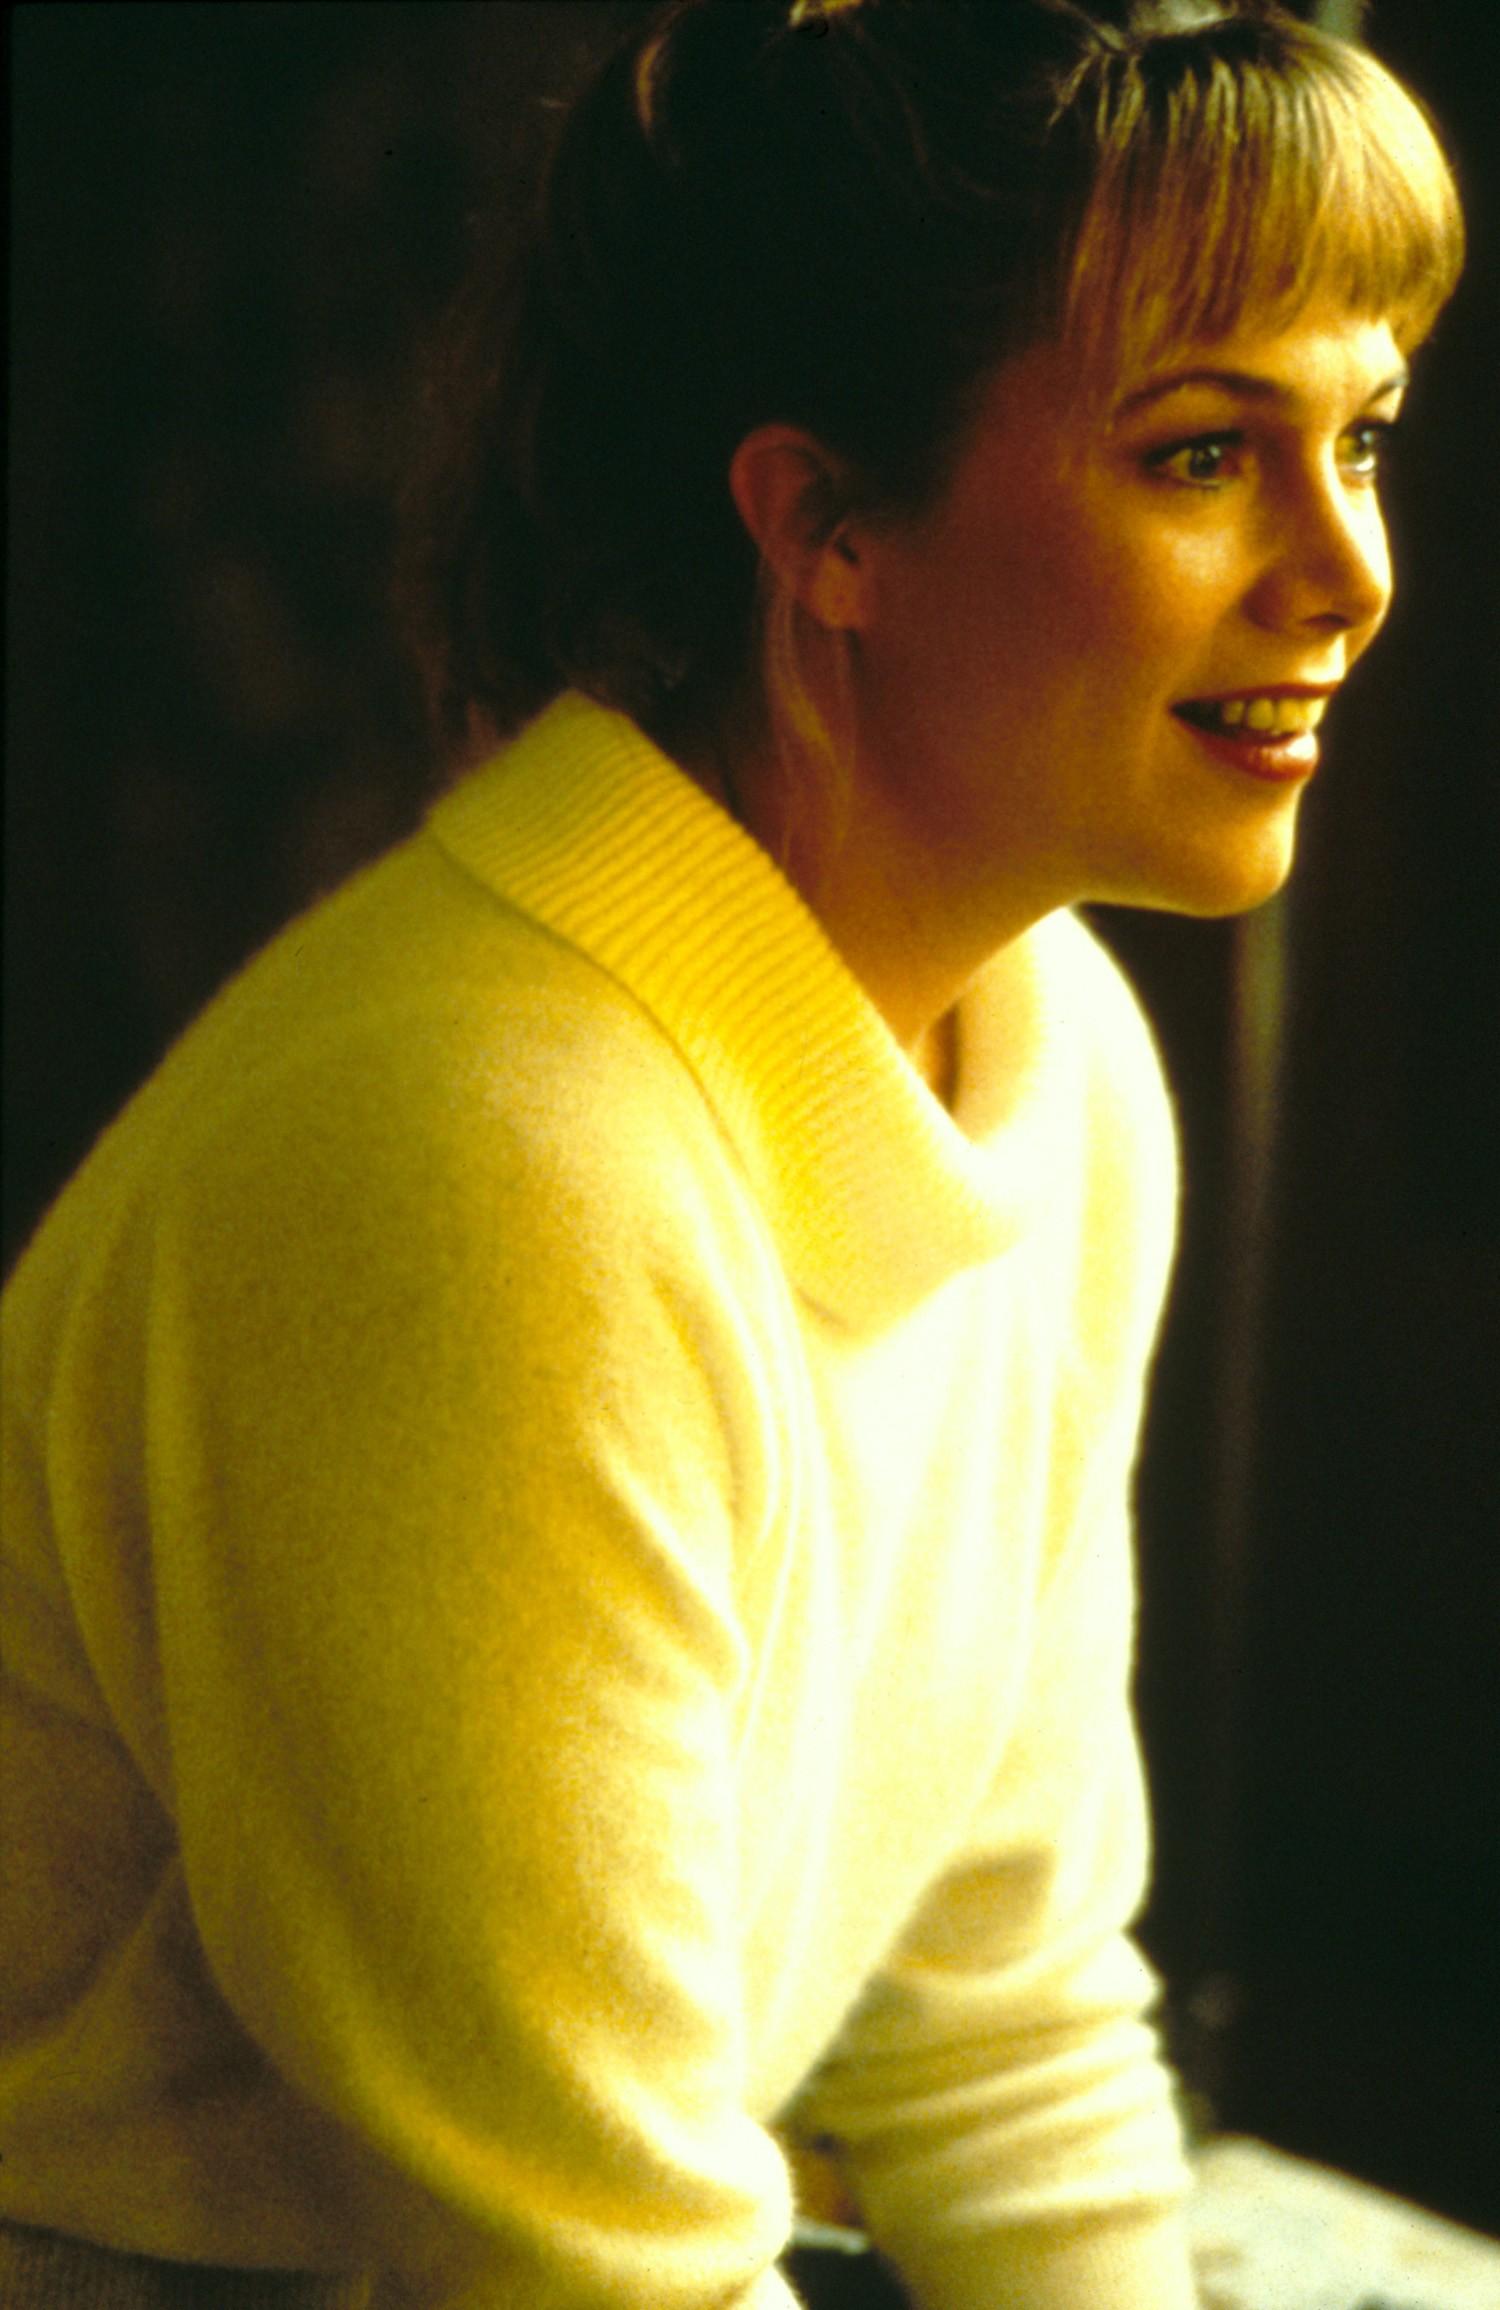 Kathleen Turner in Peggy Sue Got Married (1986)